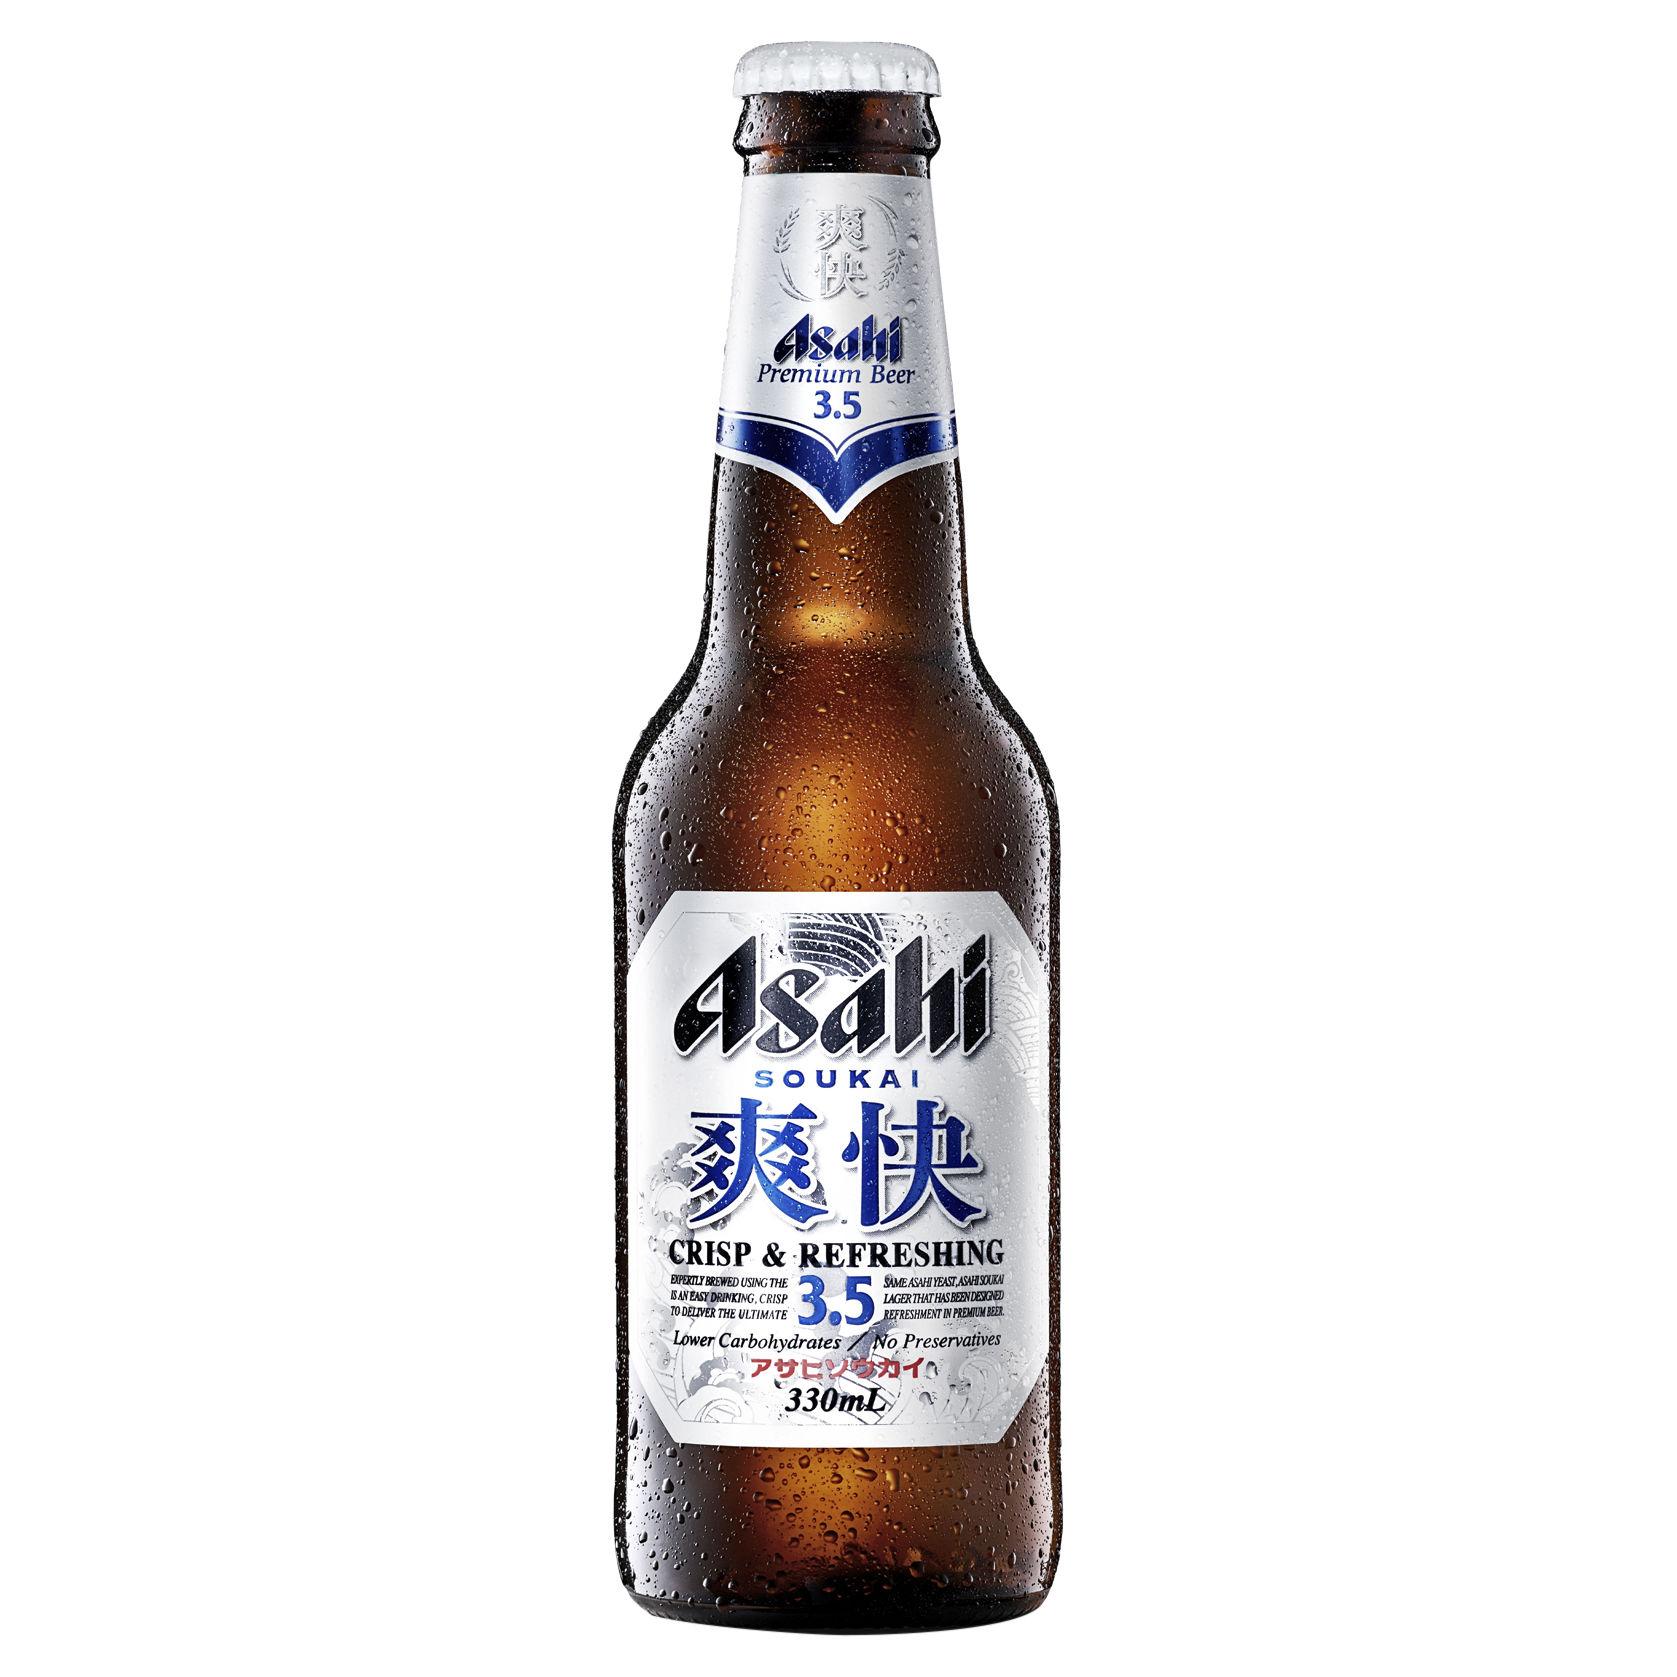 ASAHI SOUKAI